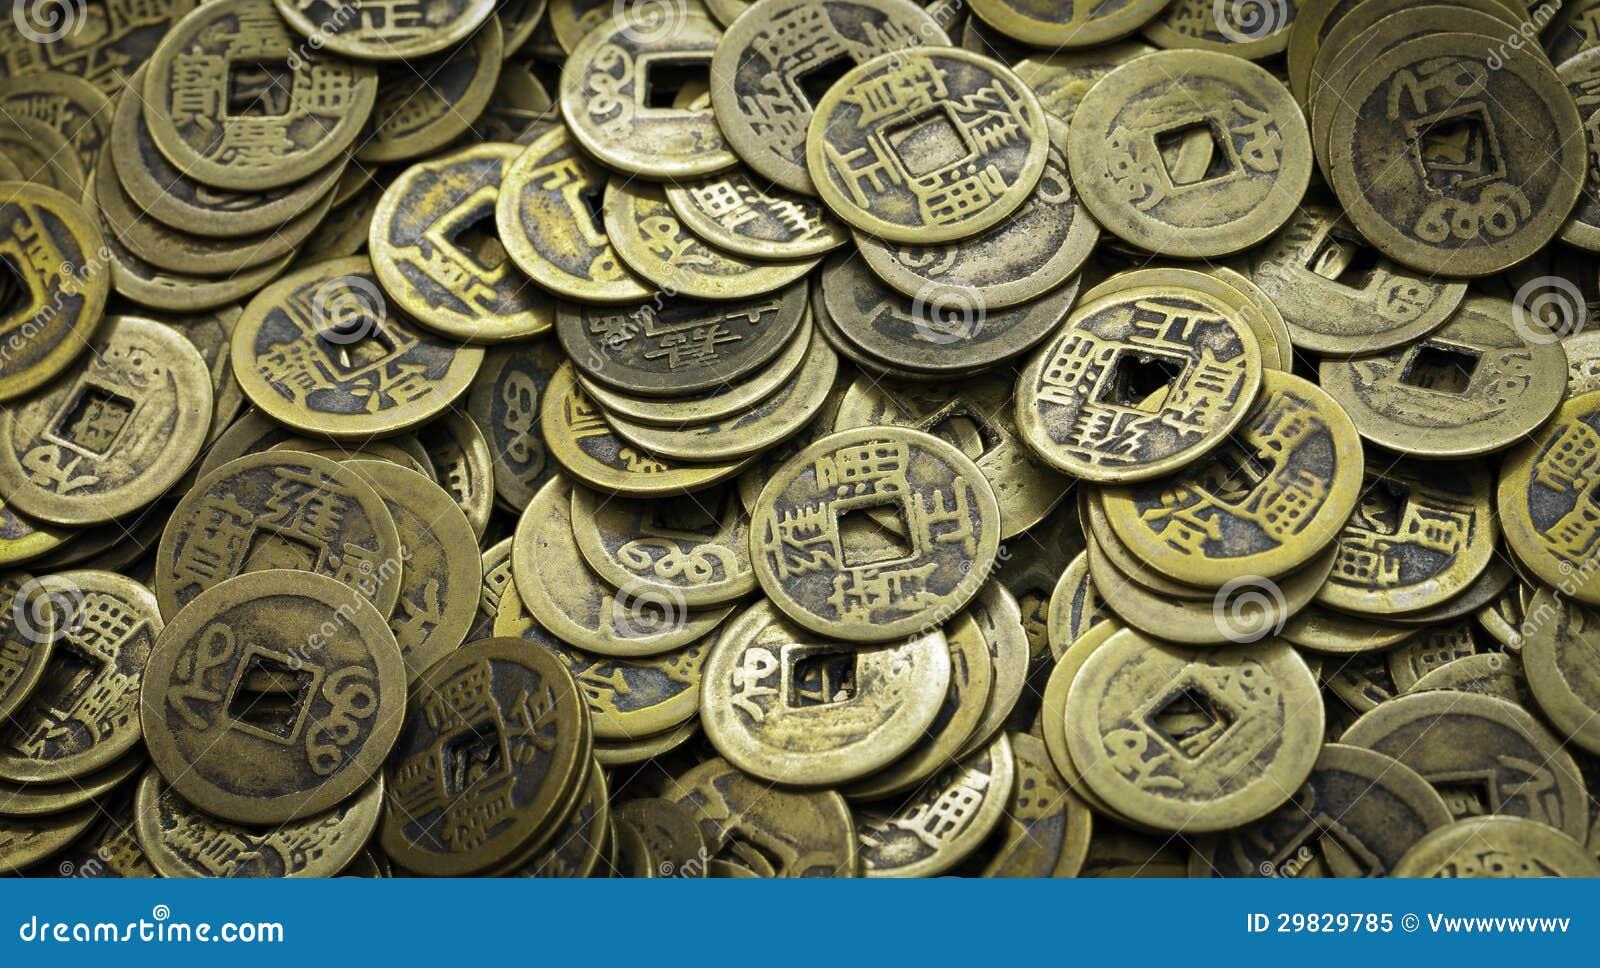 Старые китайские монетки